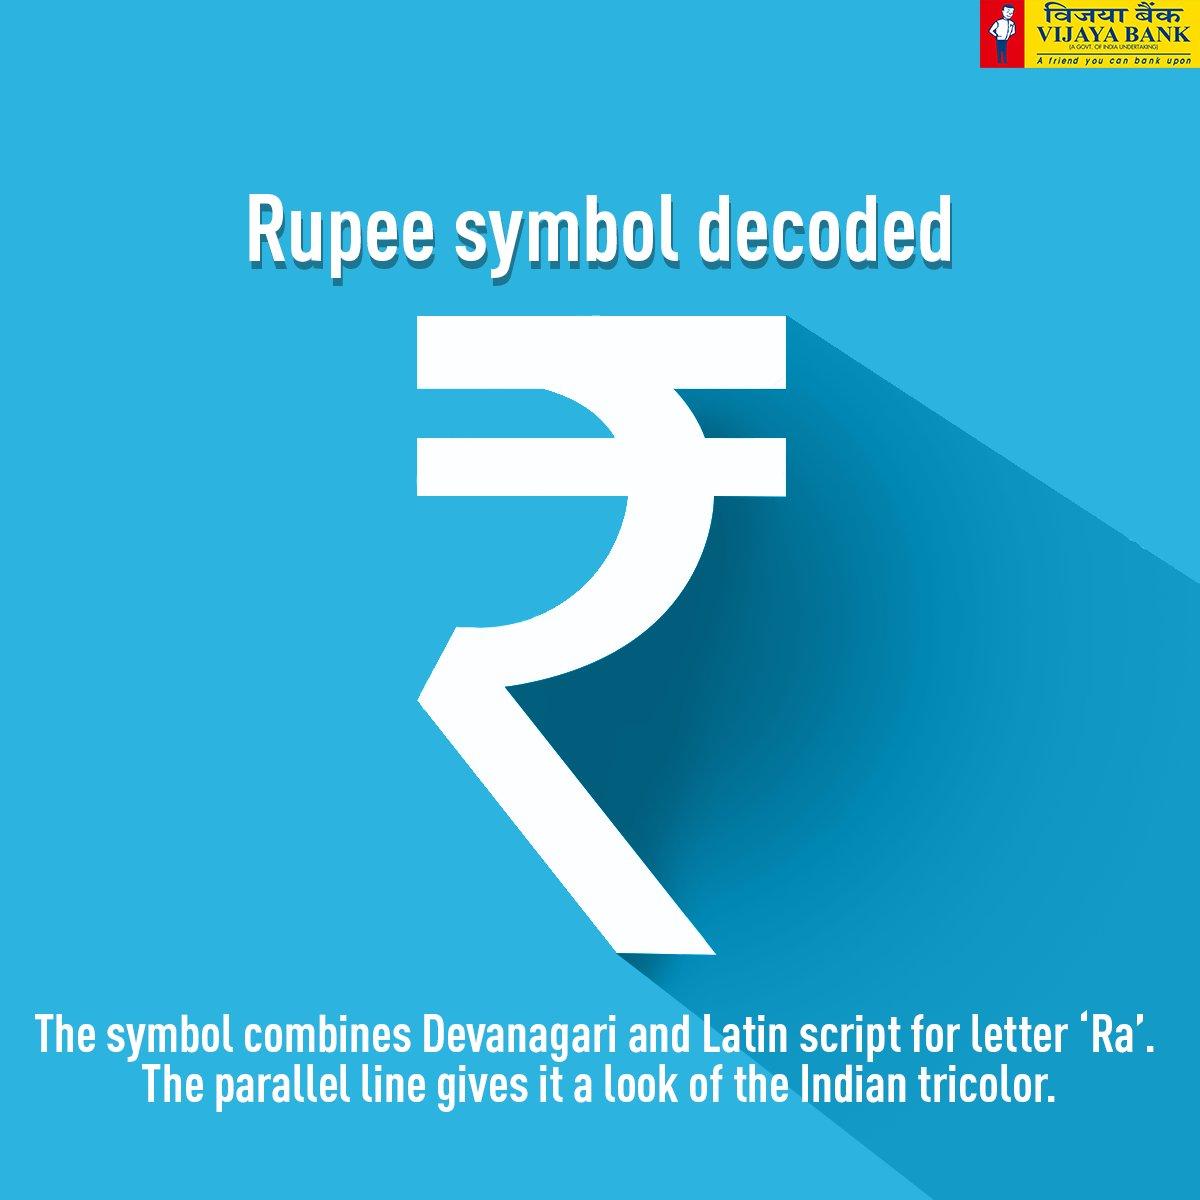 Vijaya bank on twitter the rupee symbol designed by d udaya 732 am 16 mar 2017 biocorpaavc Choice Image